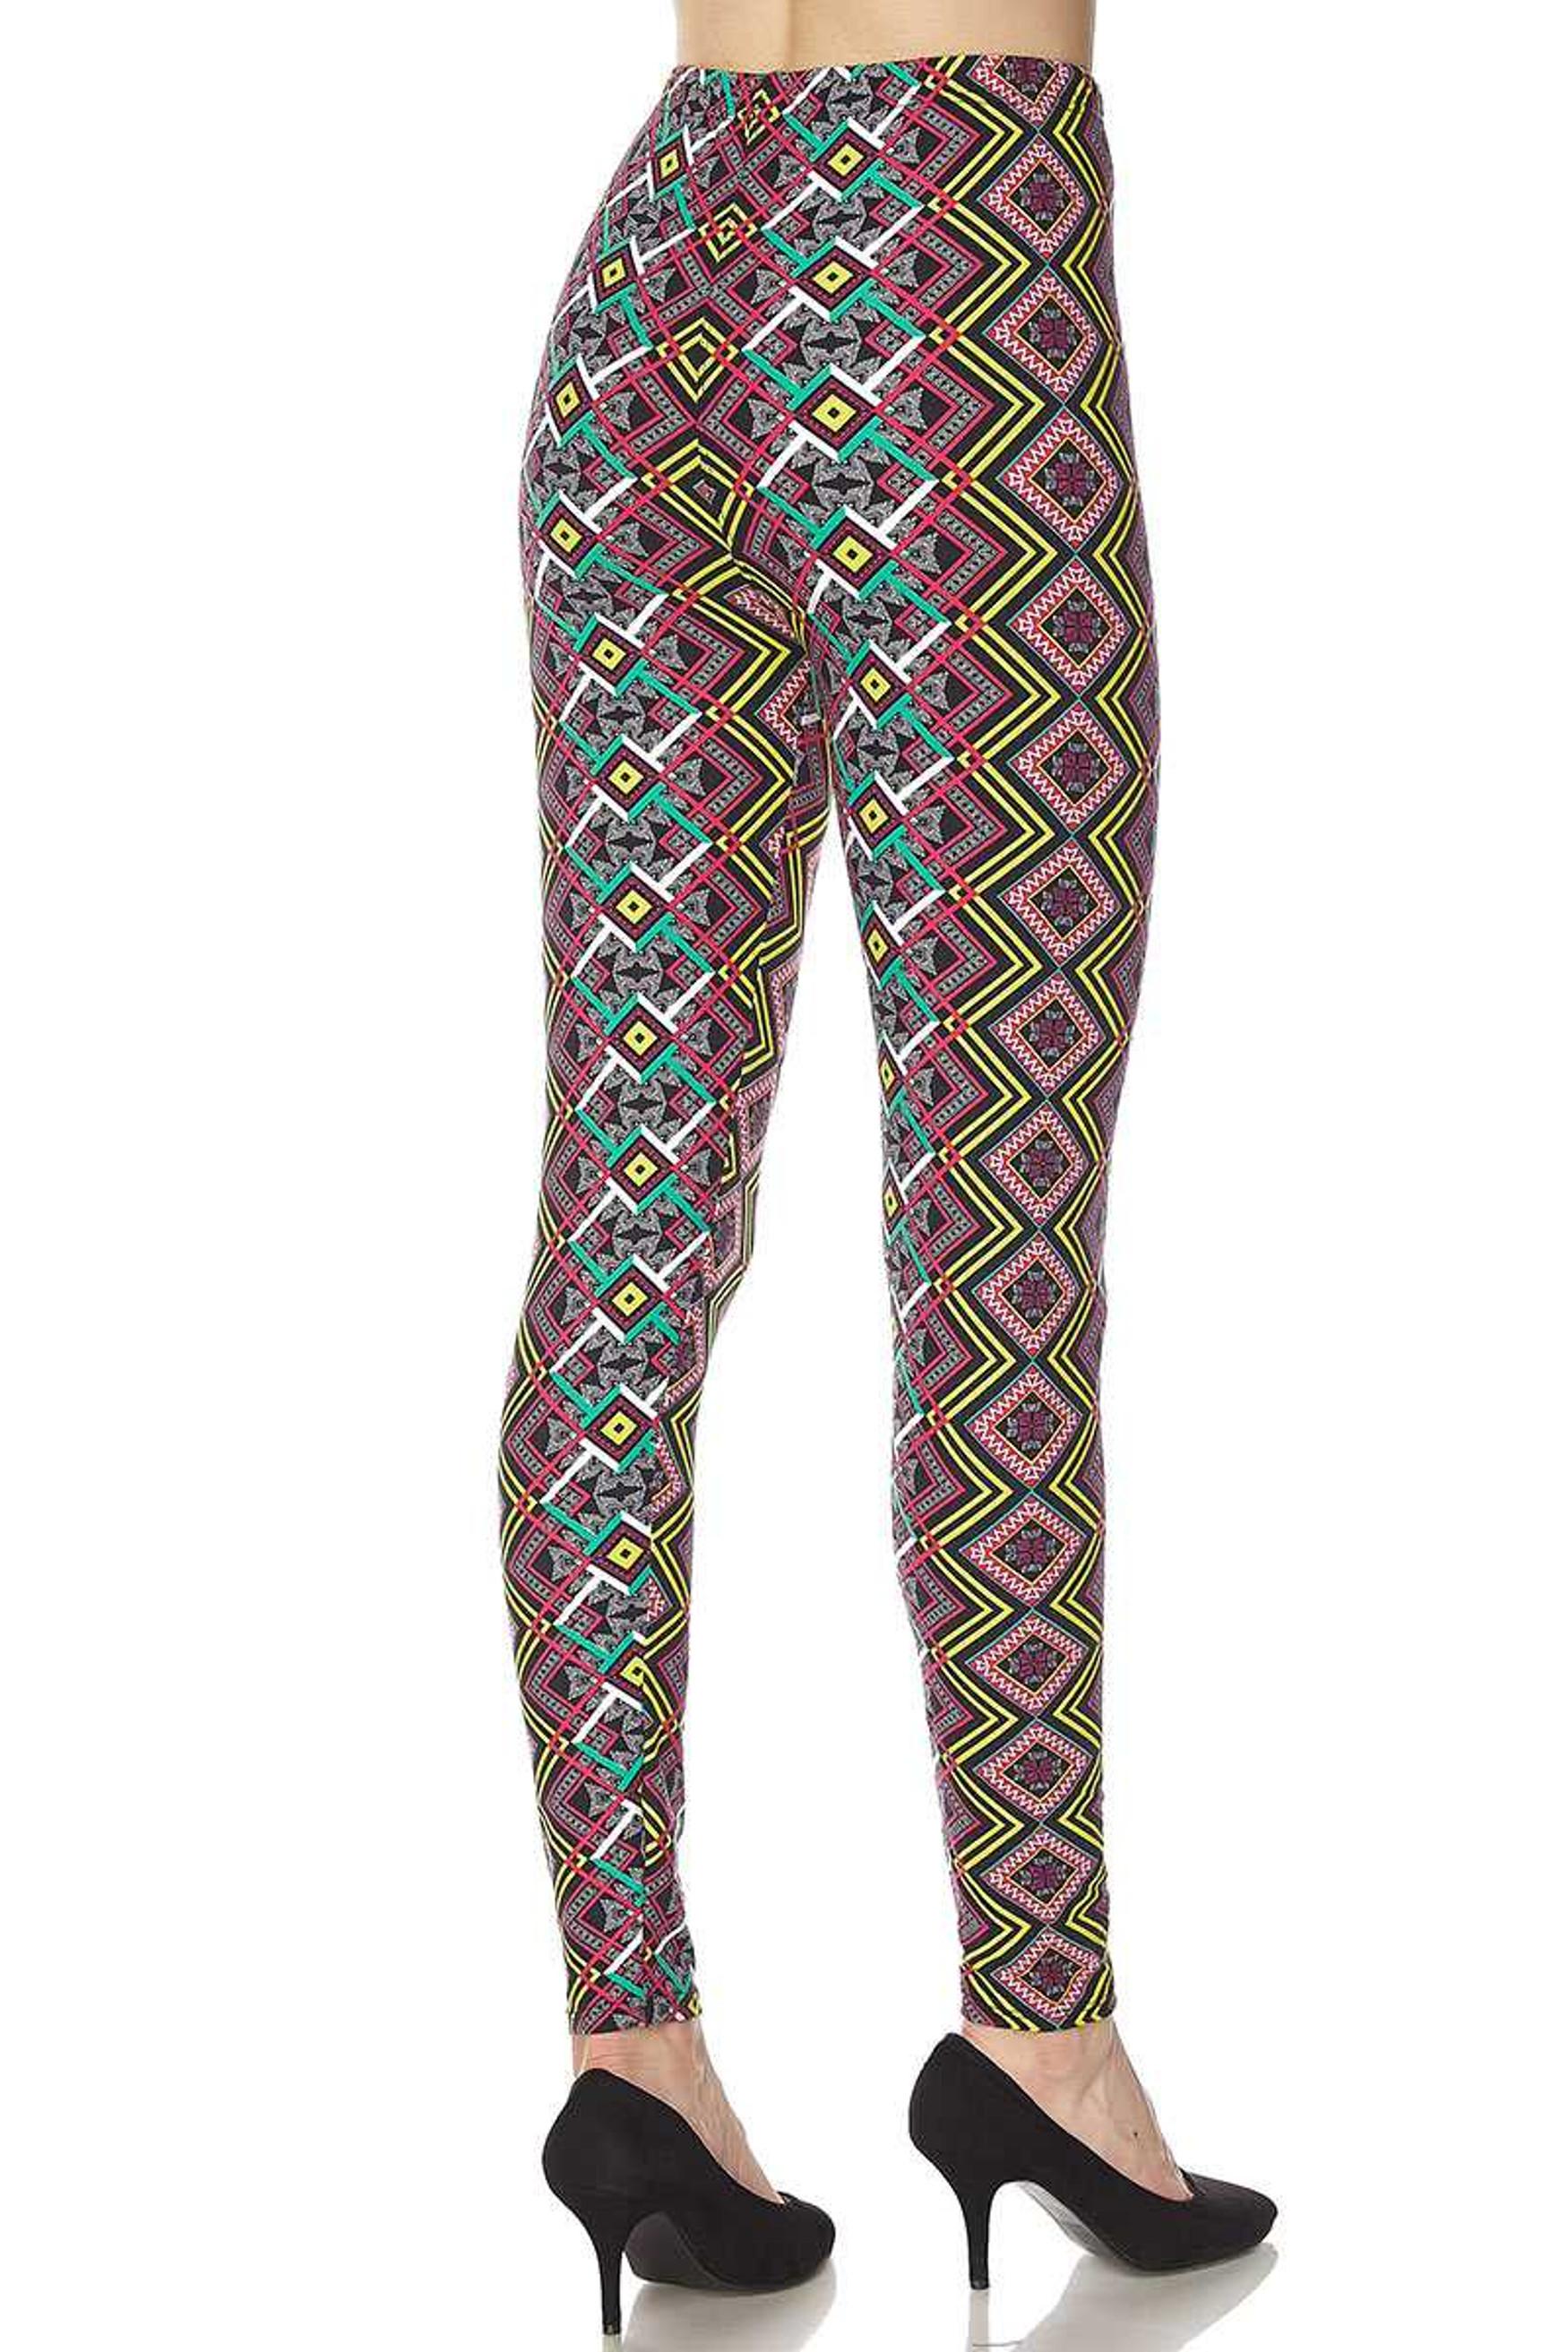 Brushed Angled Colorful Symmetry Leggings